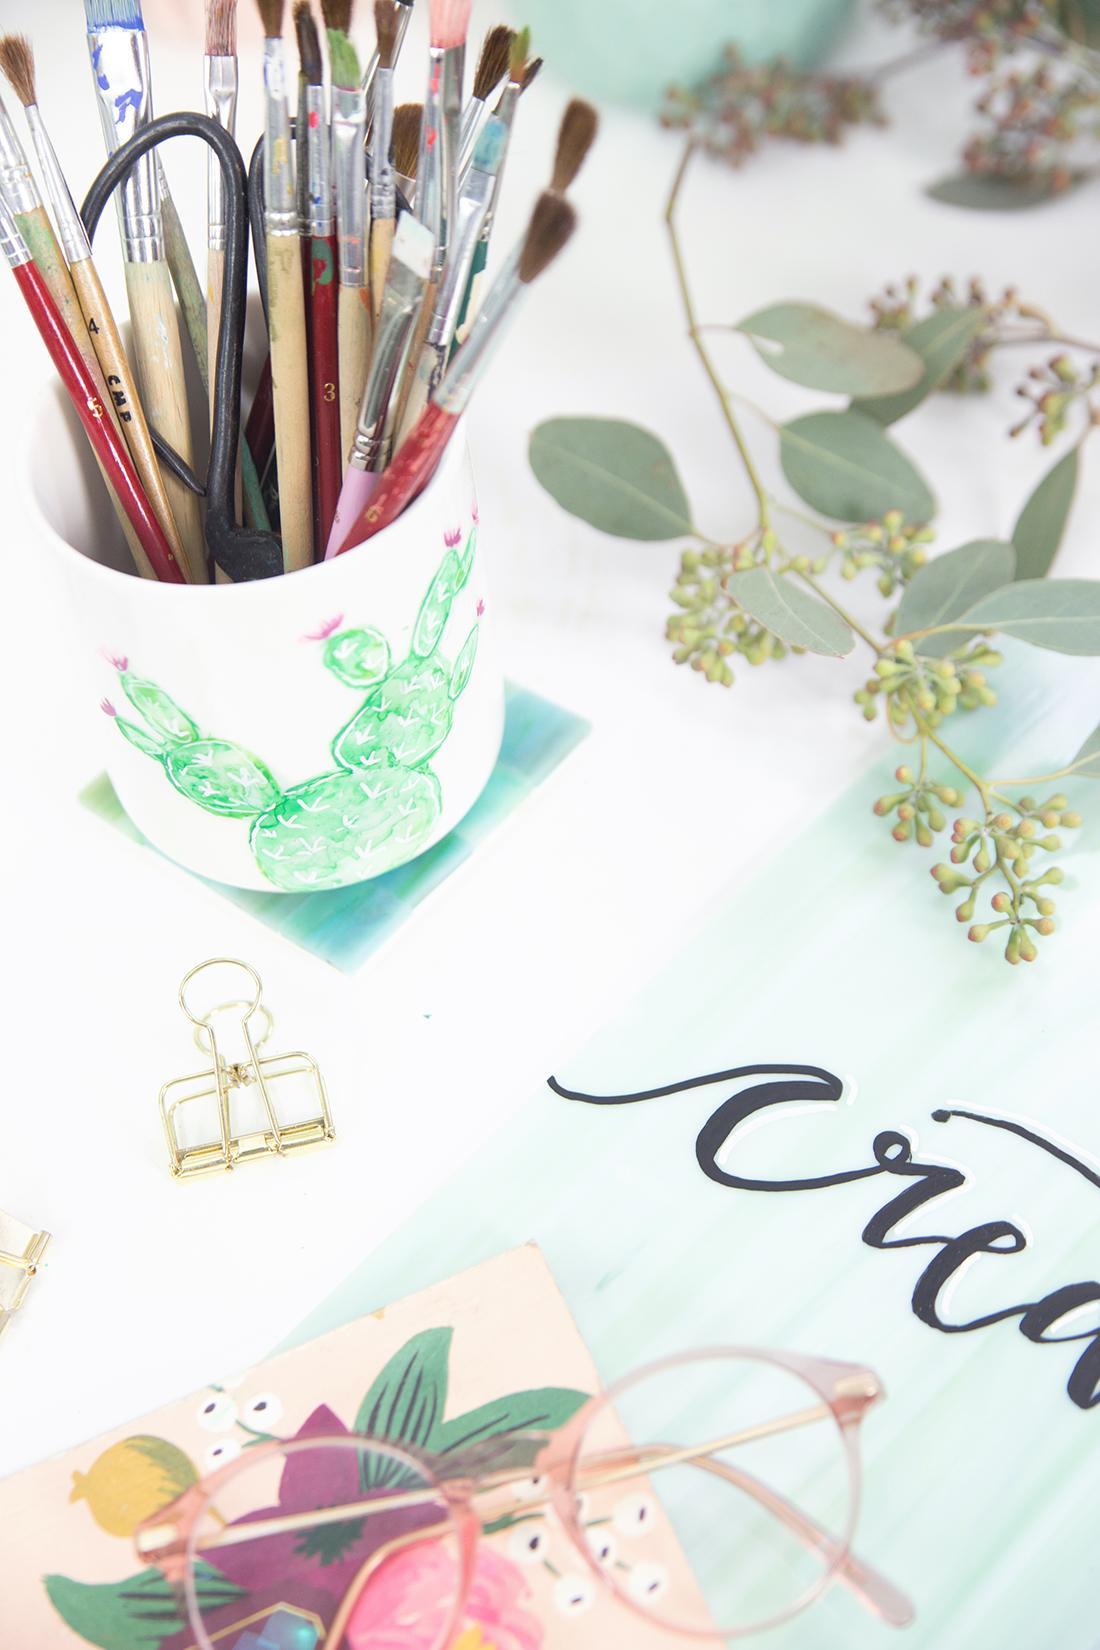 diy aquarell kaktus auf porzellan und lettering auf glas. Black Bedroom Furniture Sets. Home Design Ideas